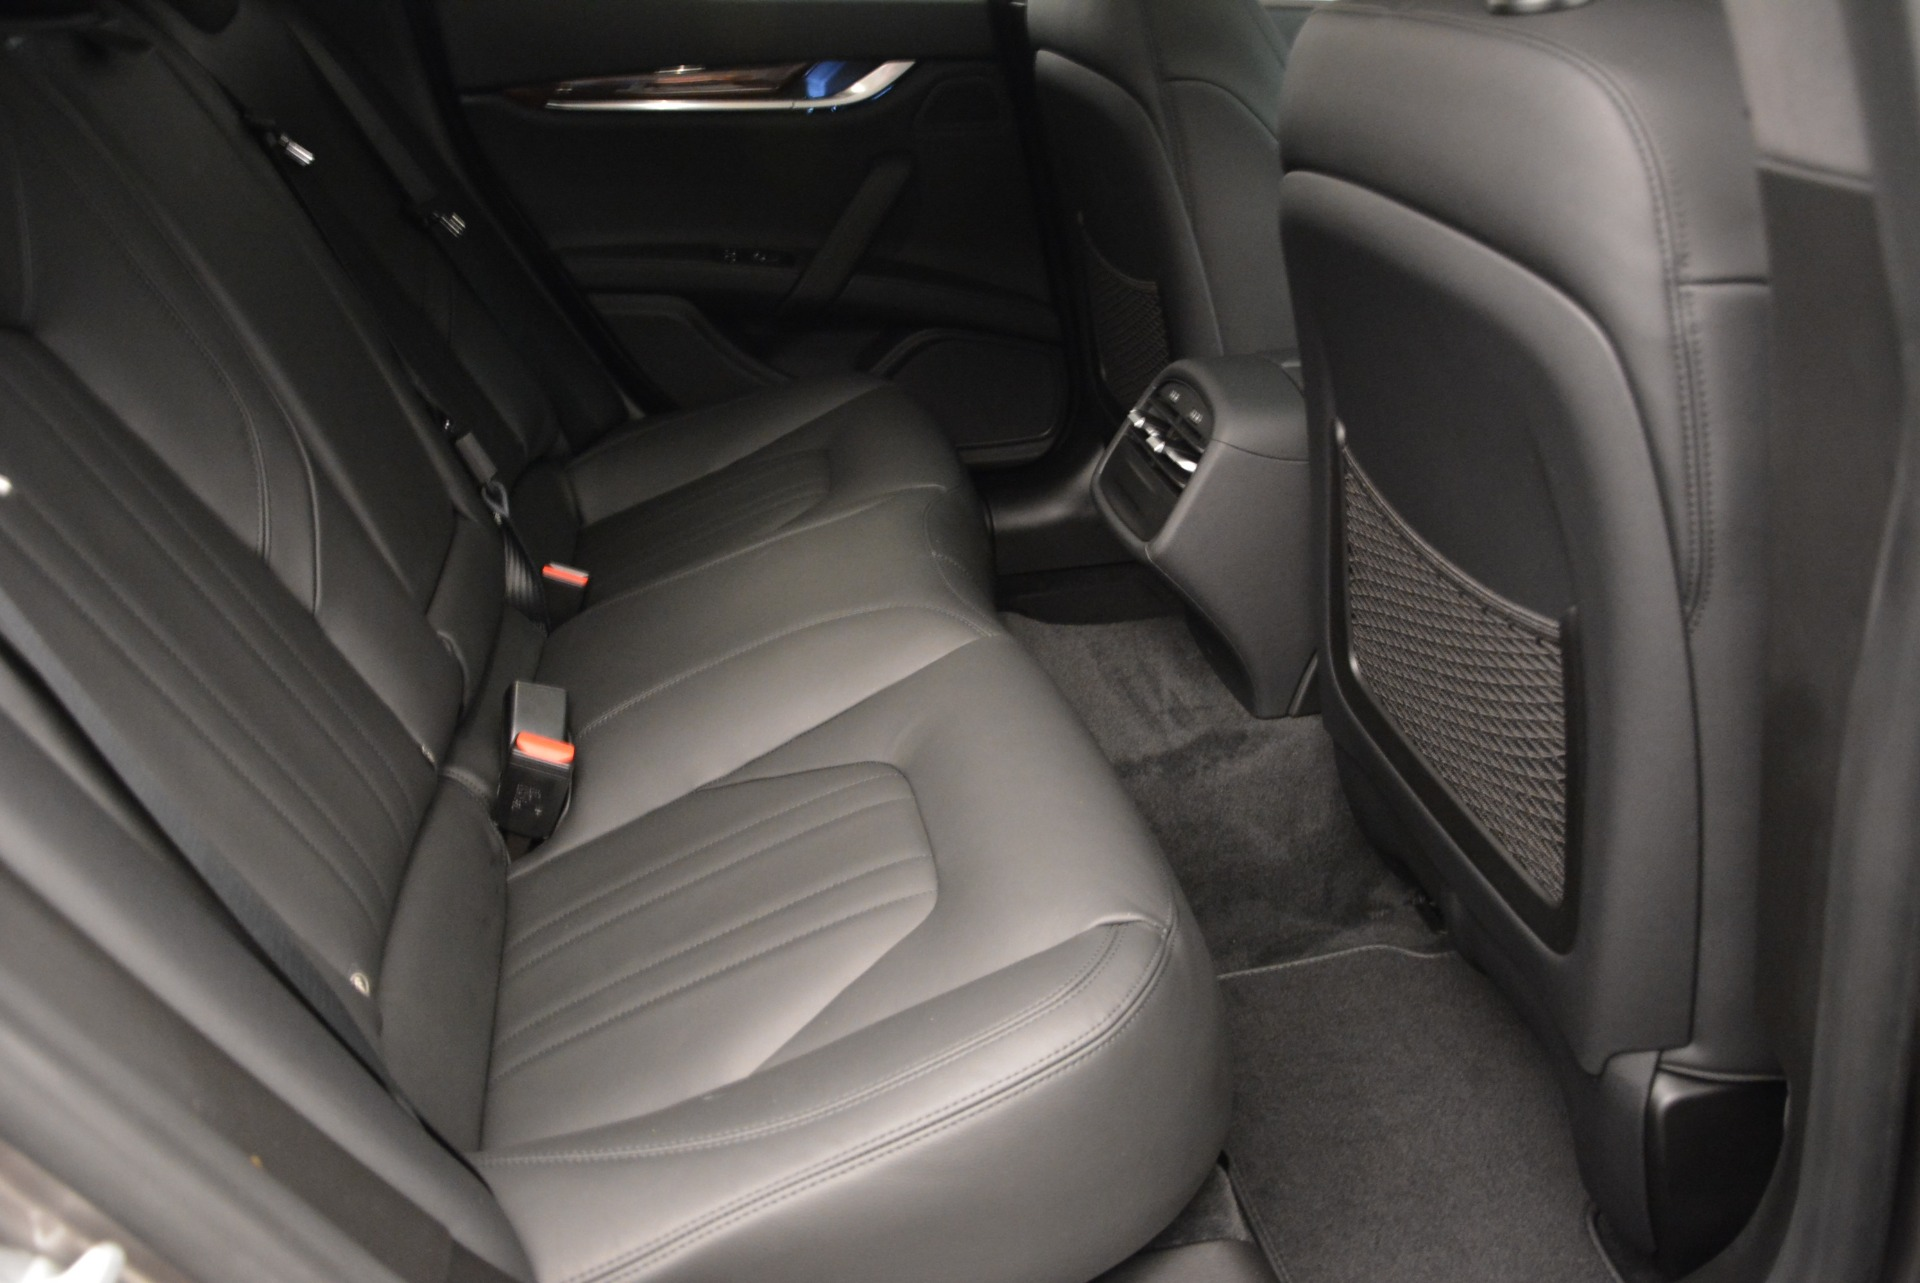 Used 2014 Maserati Ghibli S Q4 For Sale In Greenwich, CT. Alfa Romeo of Greenwich, 7426 2562_p24